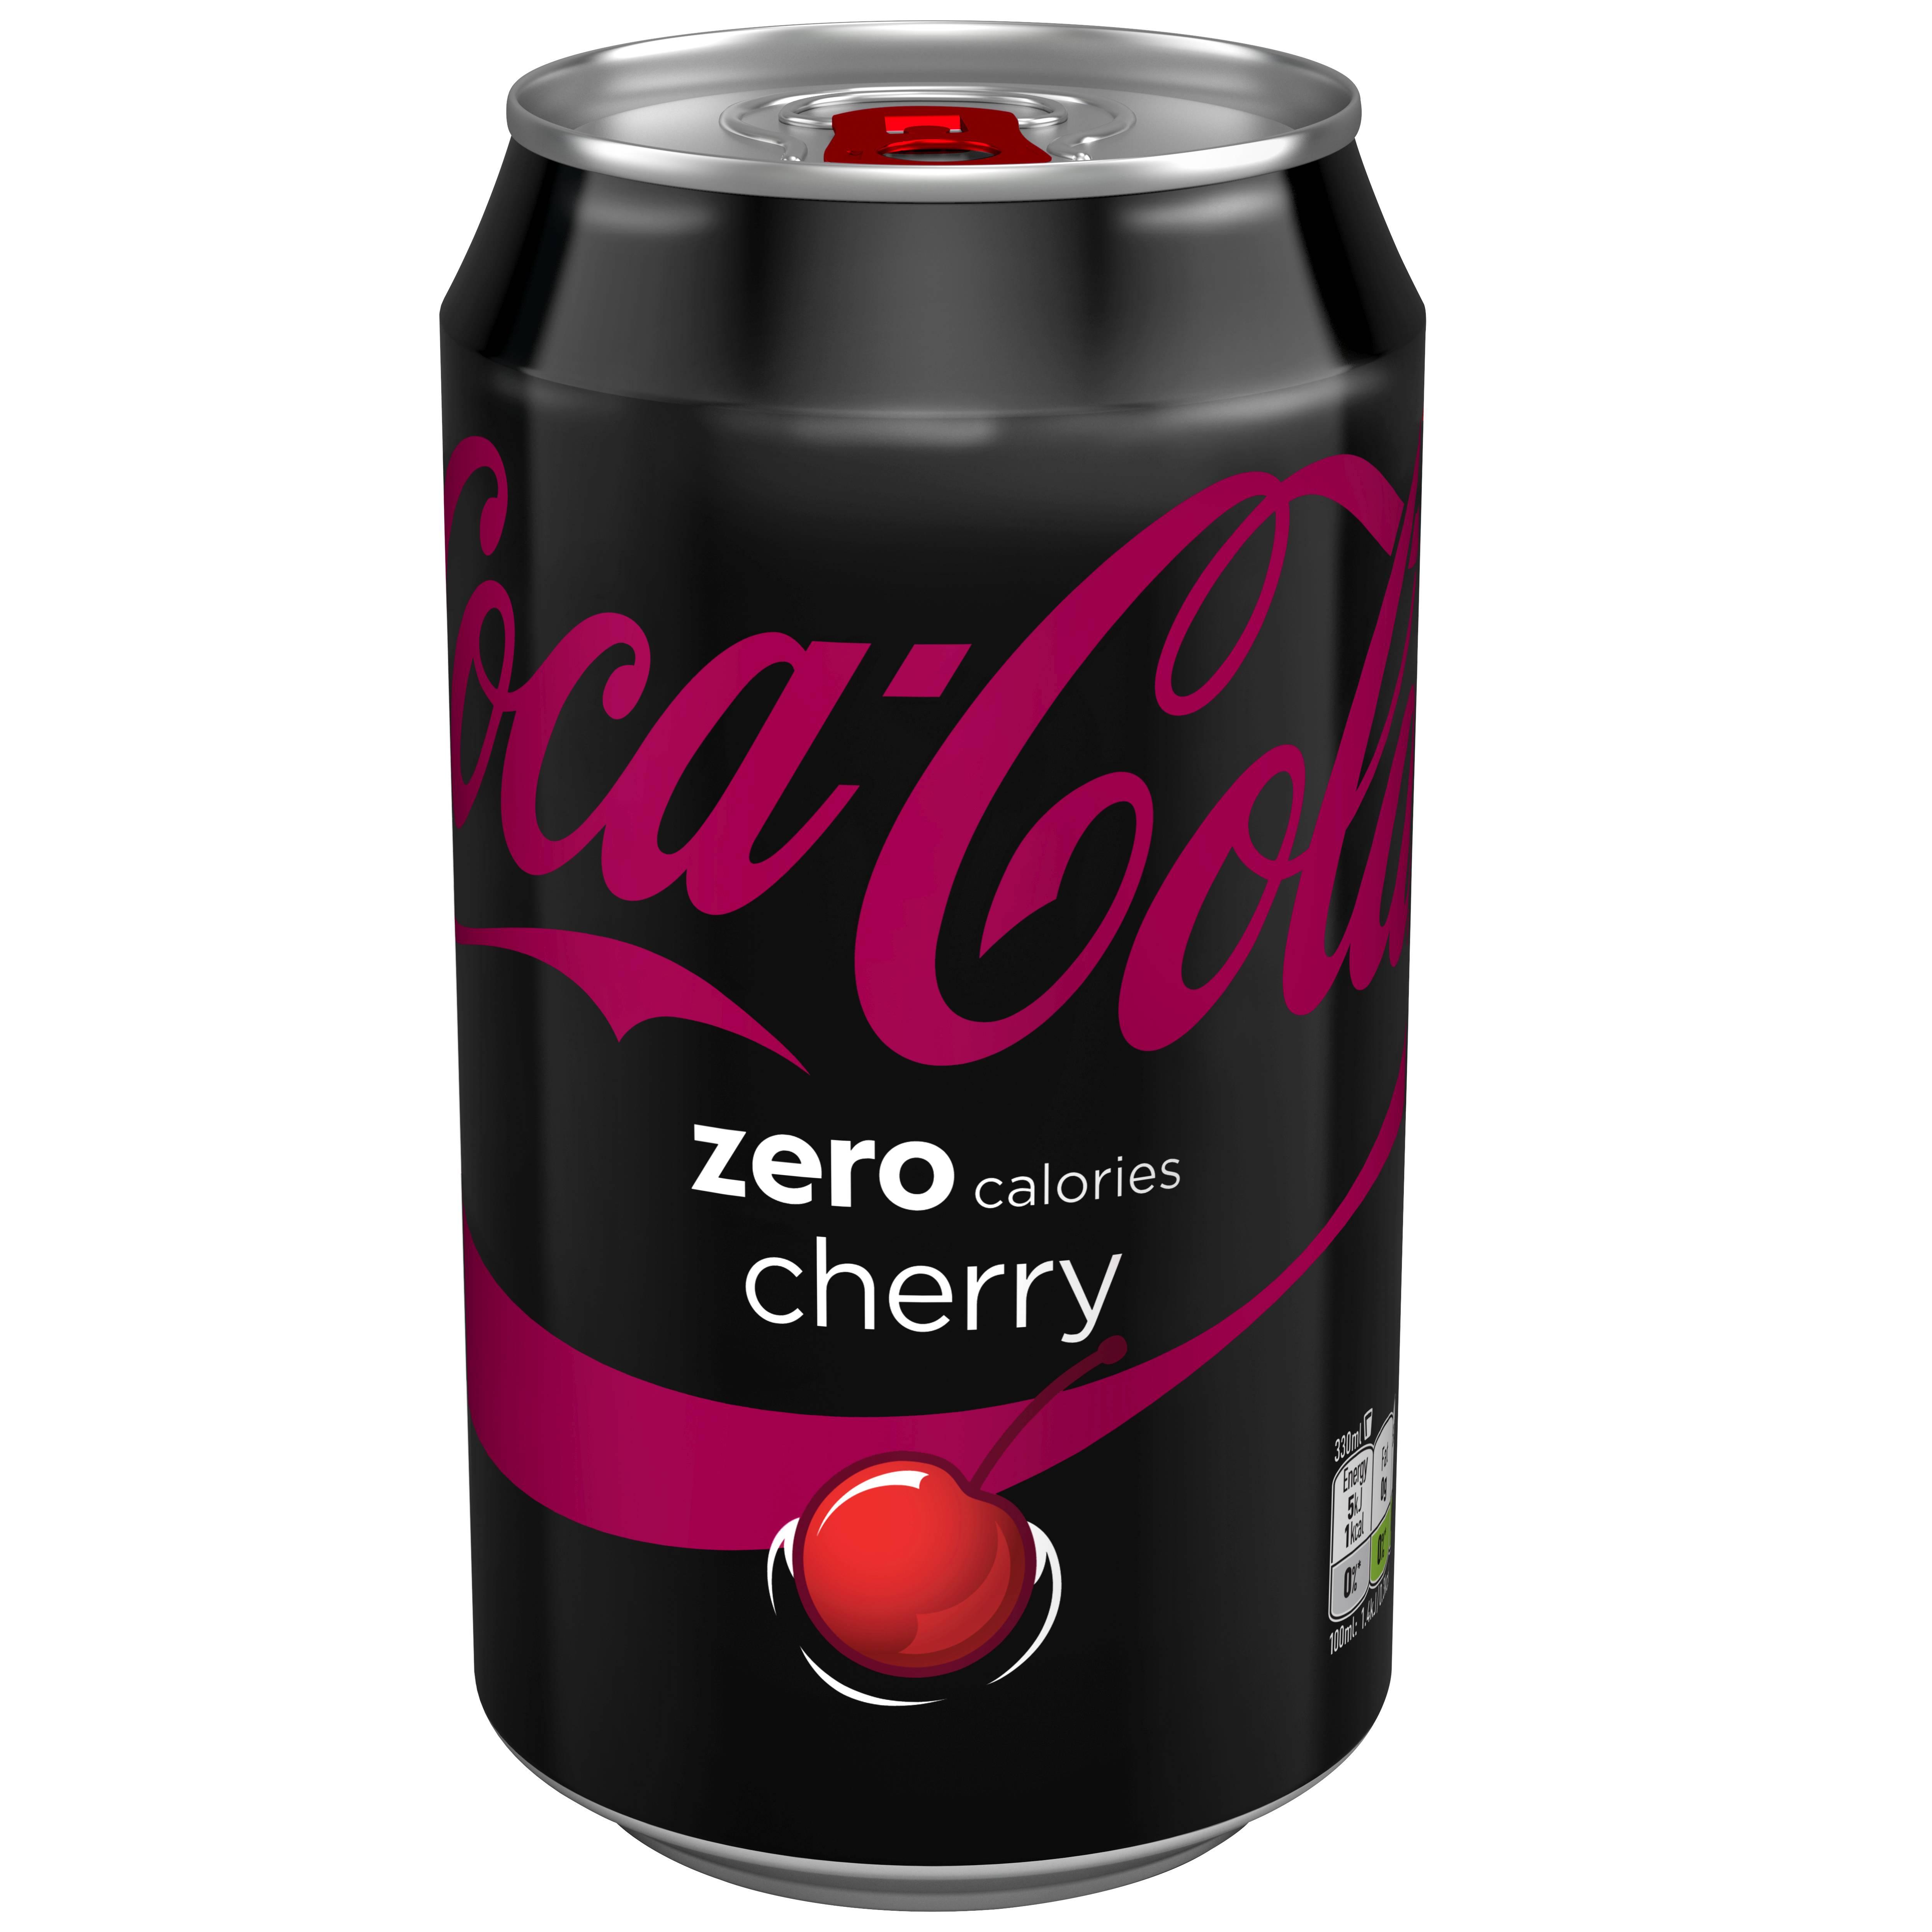 photo relating to Coke Printable Coupons named Cherry coke zero coupon codes - Insane 8 printable discount coupons